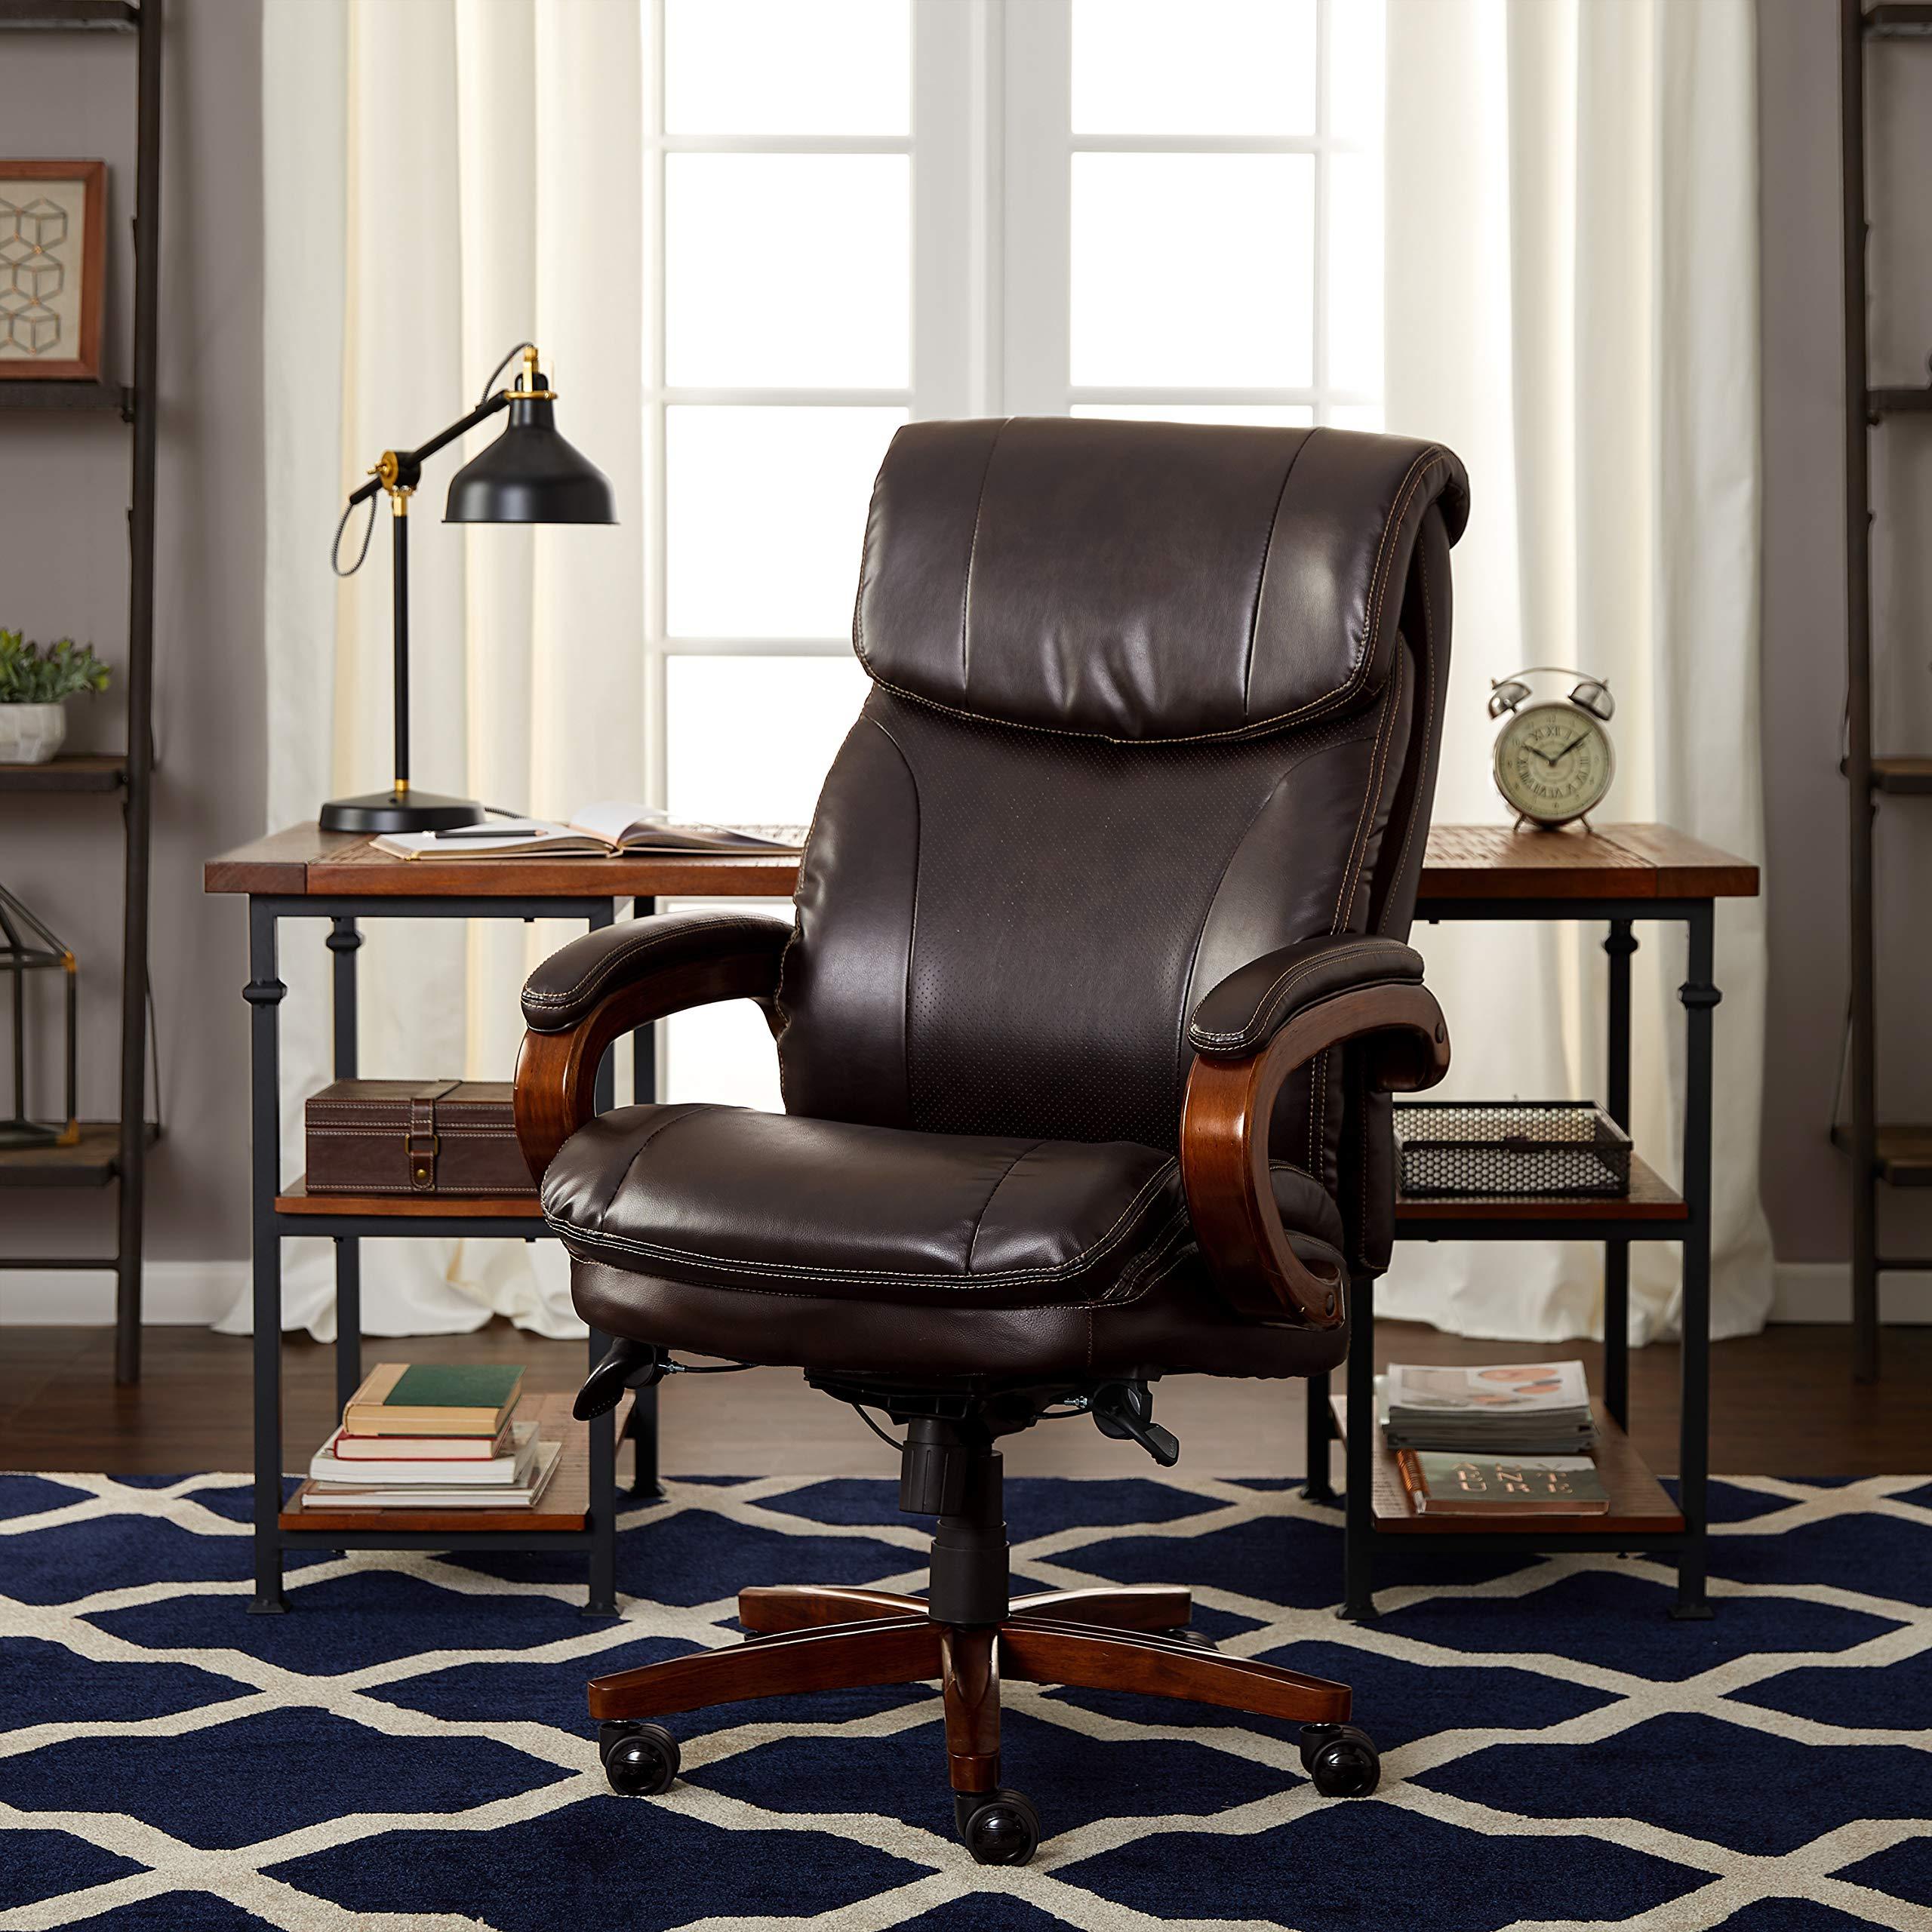 La-Z-Boy Trafford Big & Tall Executive Bonded Leather Office Chair - Vino (Brown) by La-Z-Boy